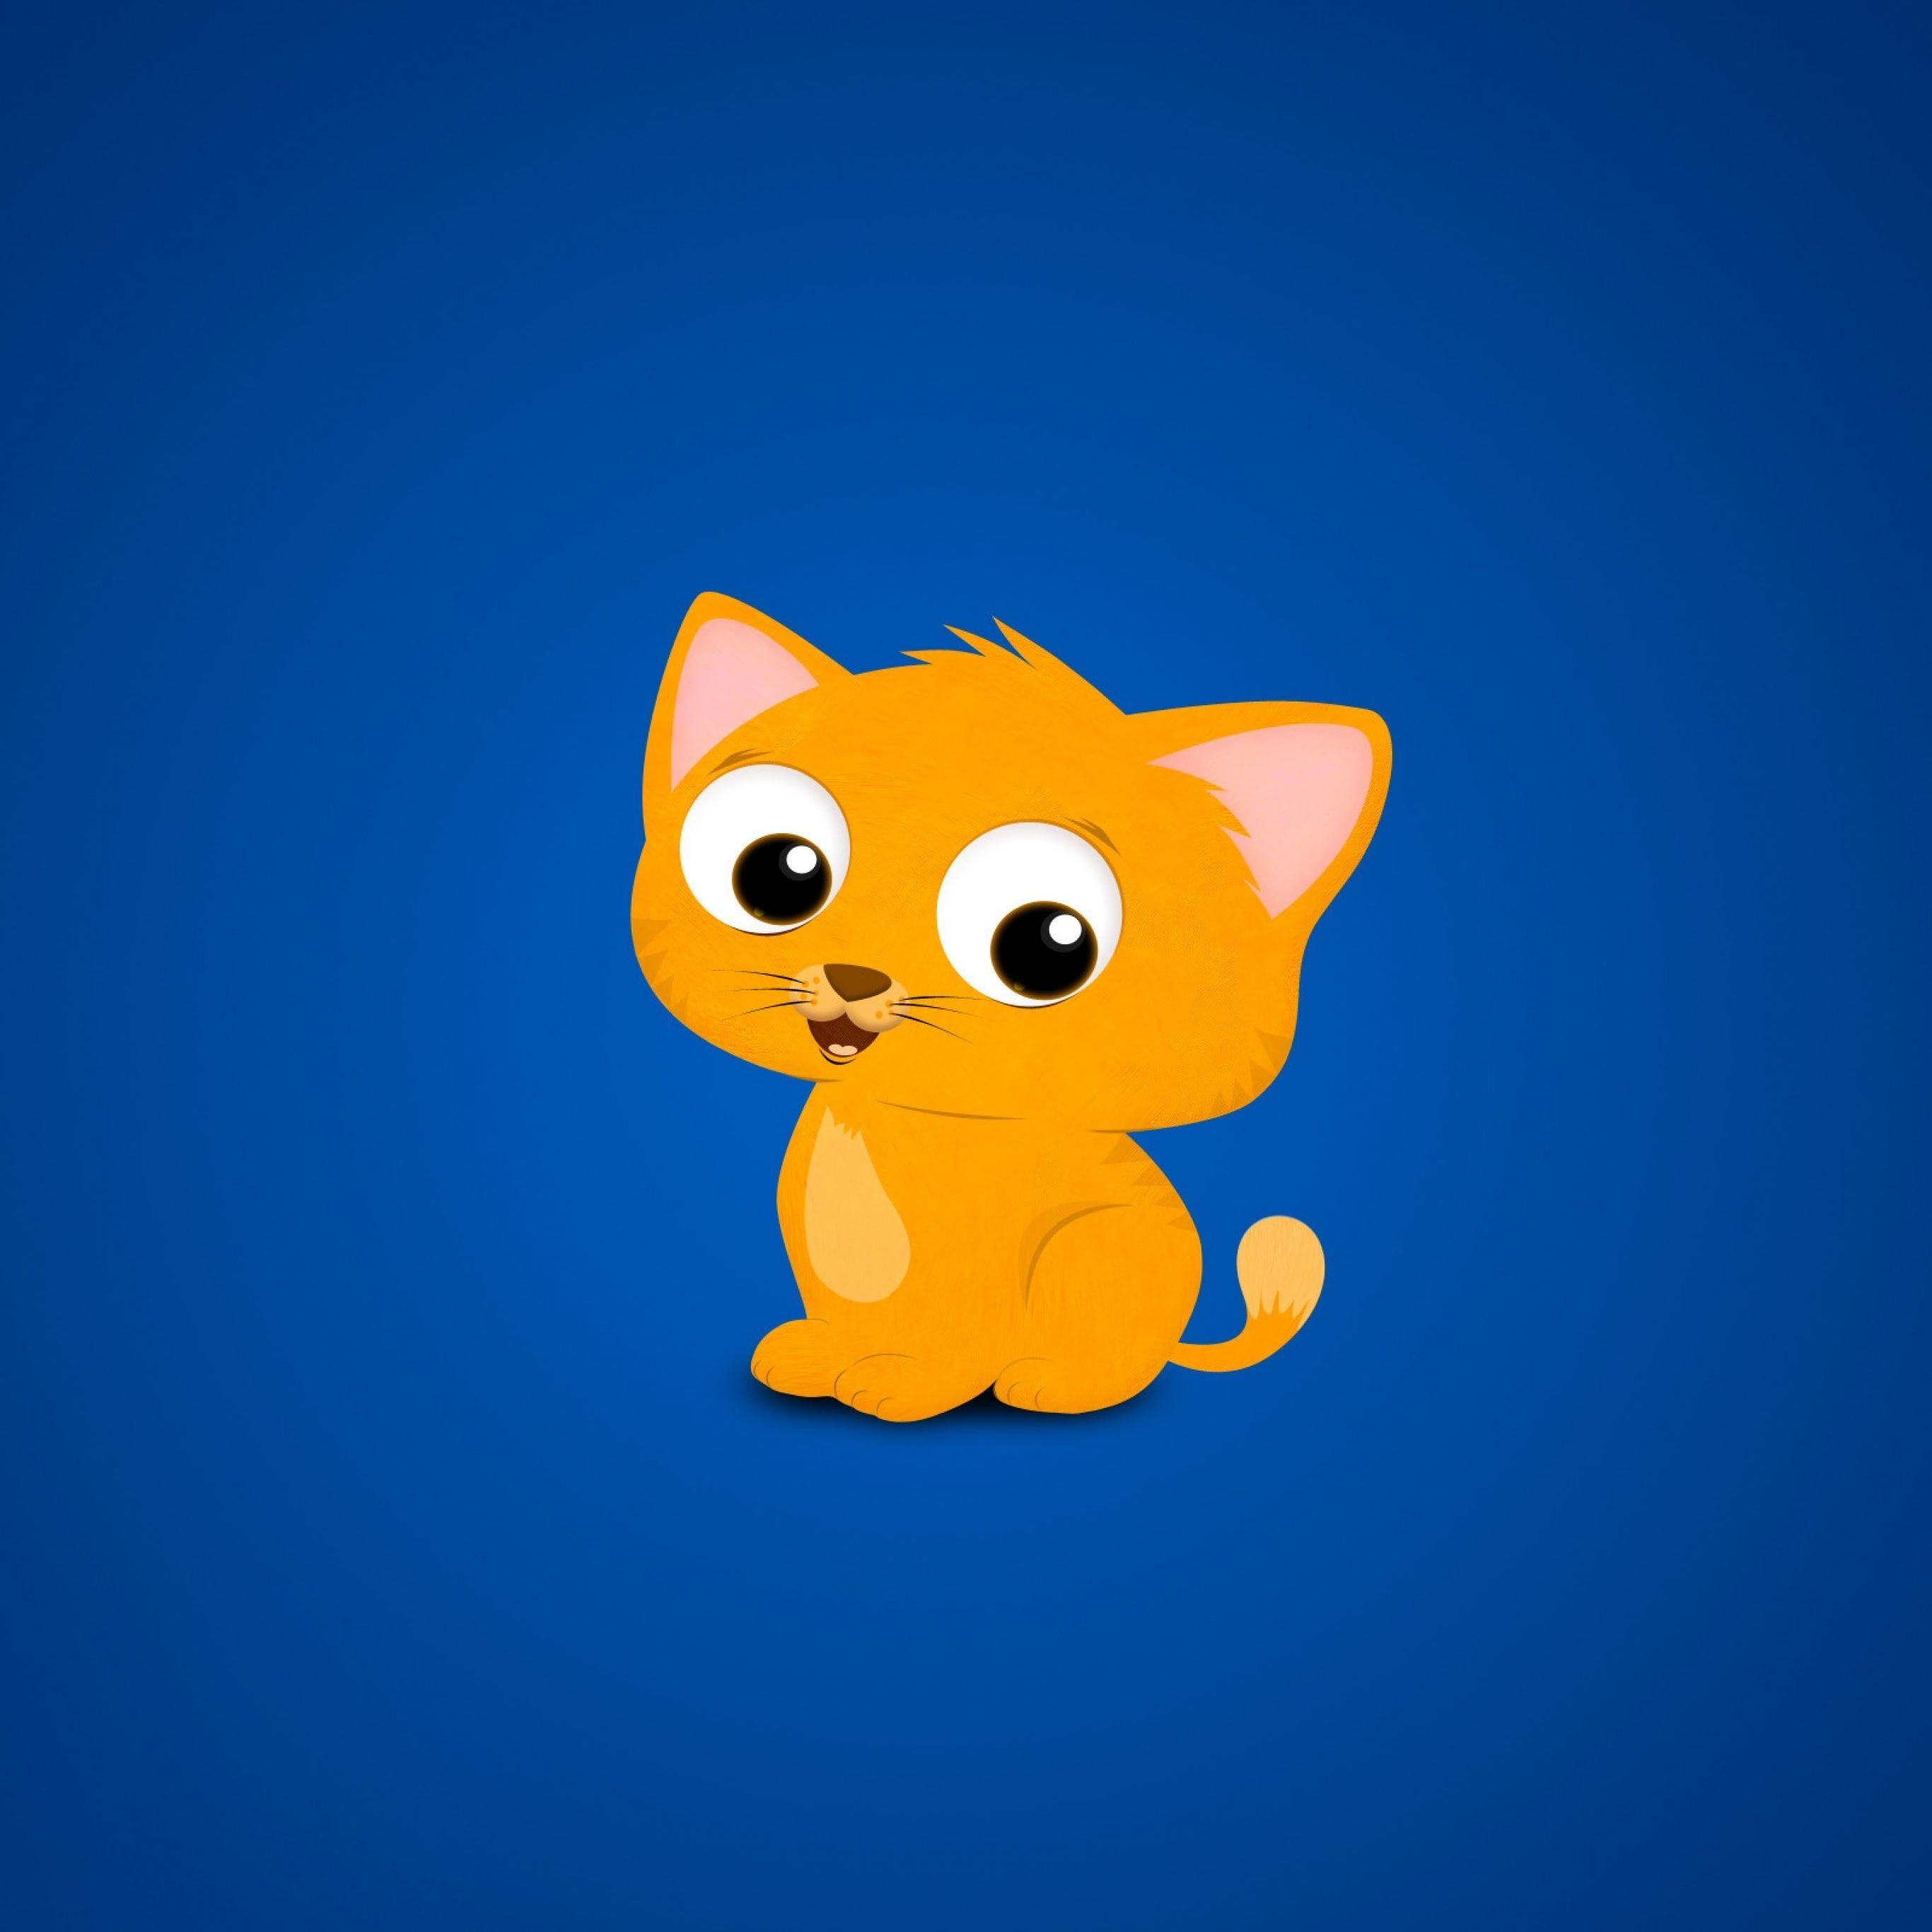 Cat kitten picture red blue iPad Pro wallpaper